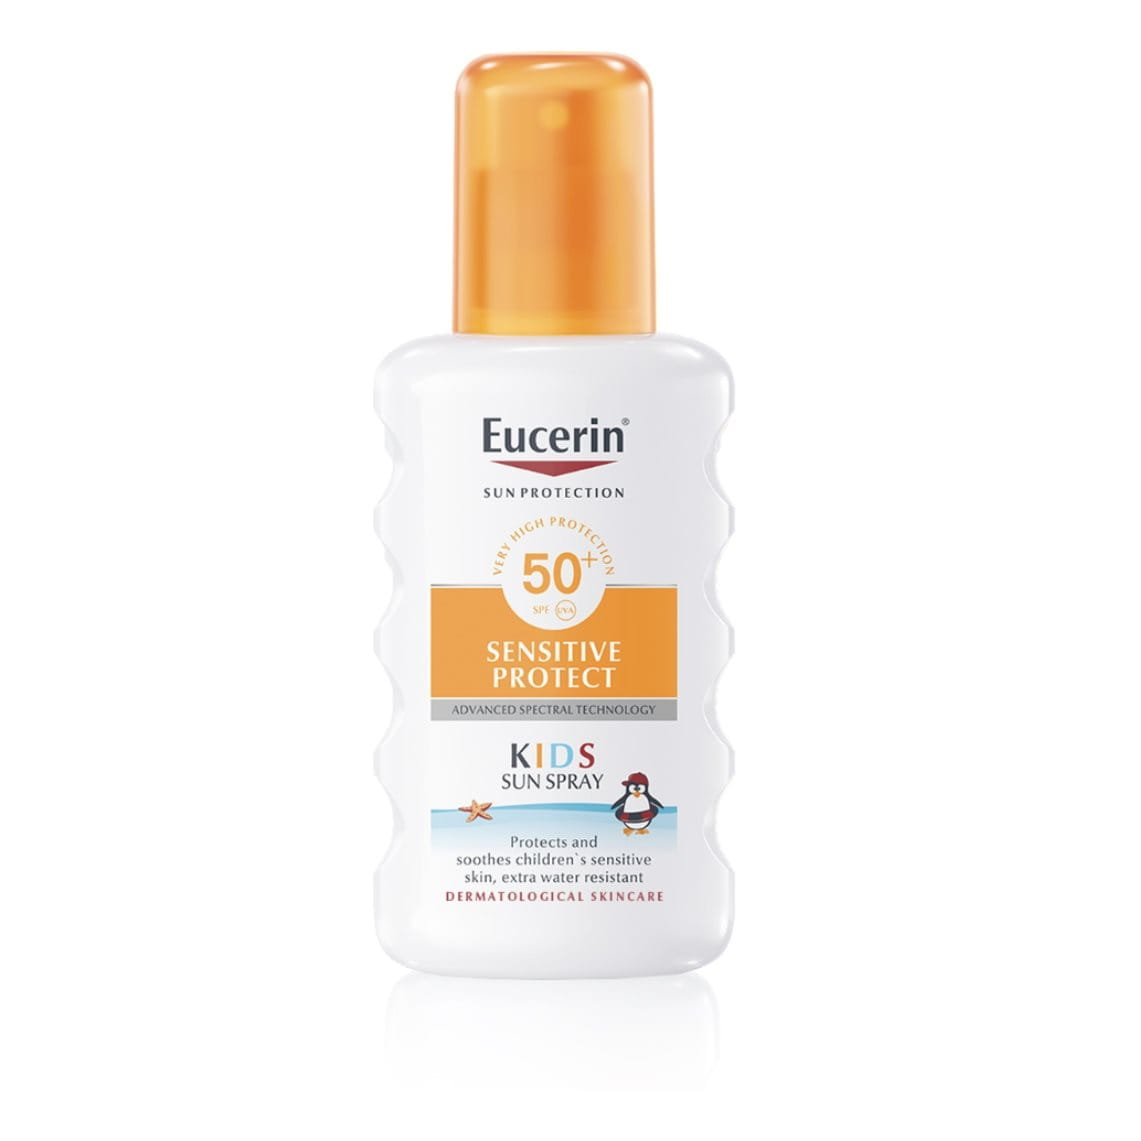 Eucerin Kids Sun Spray Sensitive Protect SPF 50+